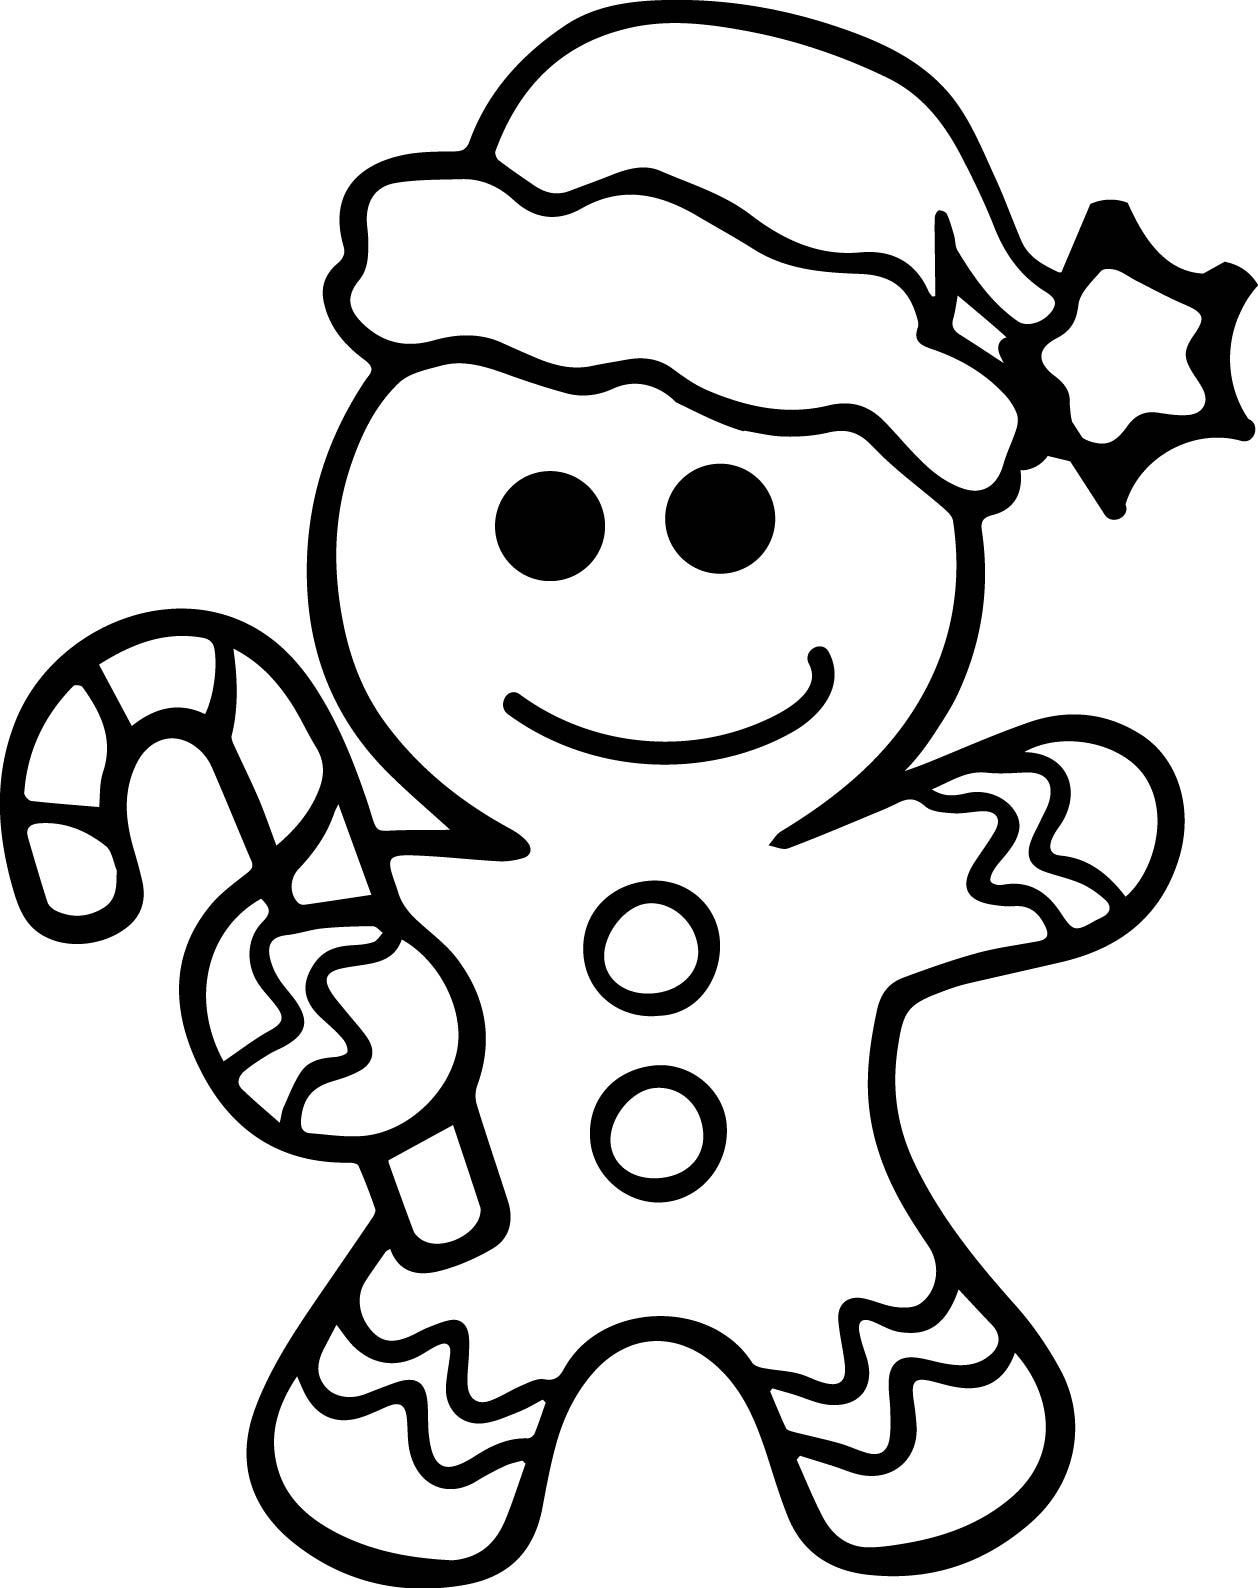 Gingerbread Man Ornament Template Worksheet